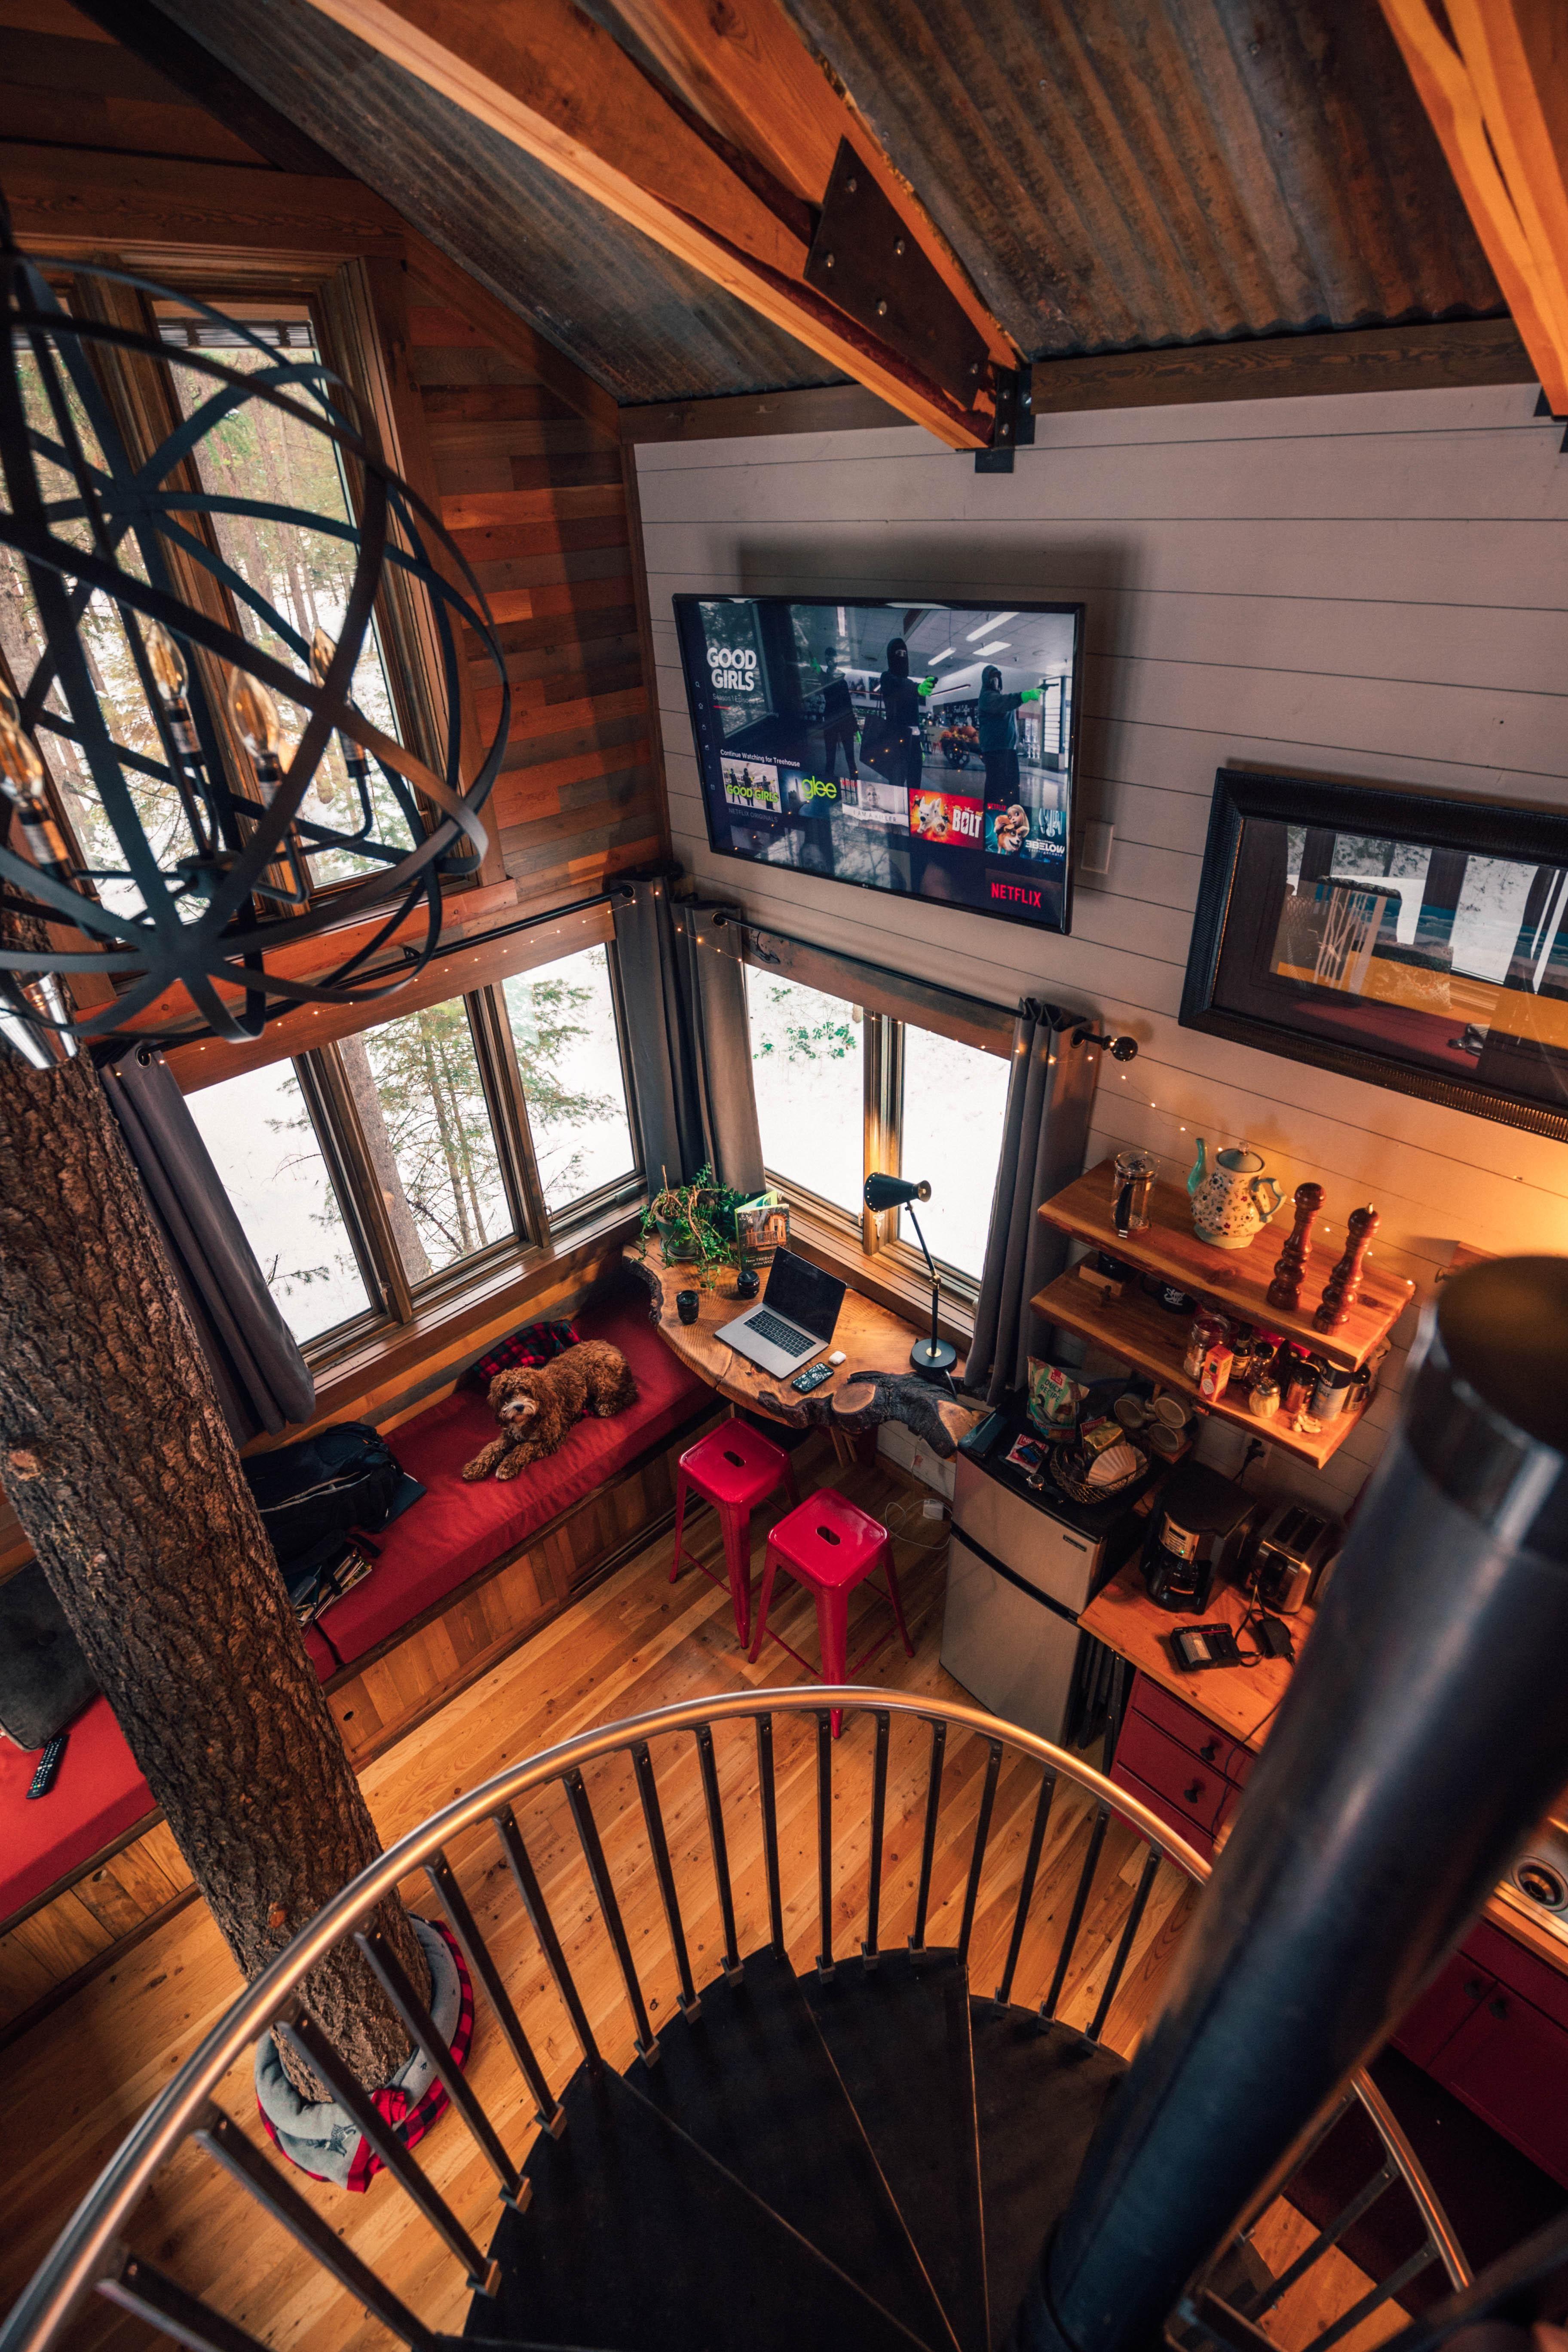 A cozy treehouse interior in Montana OC 3648x5472 # ...